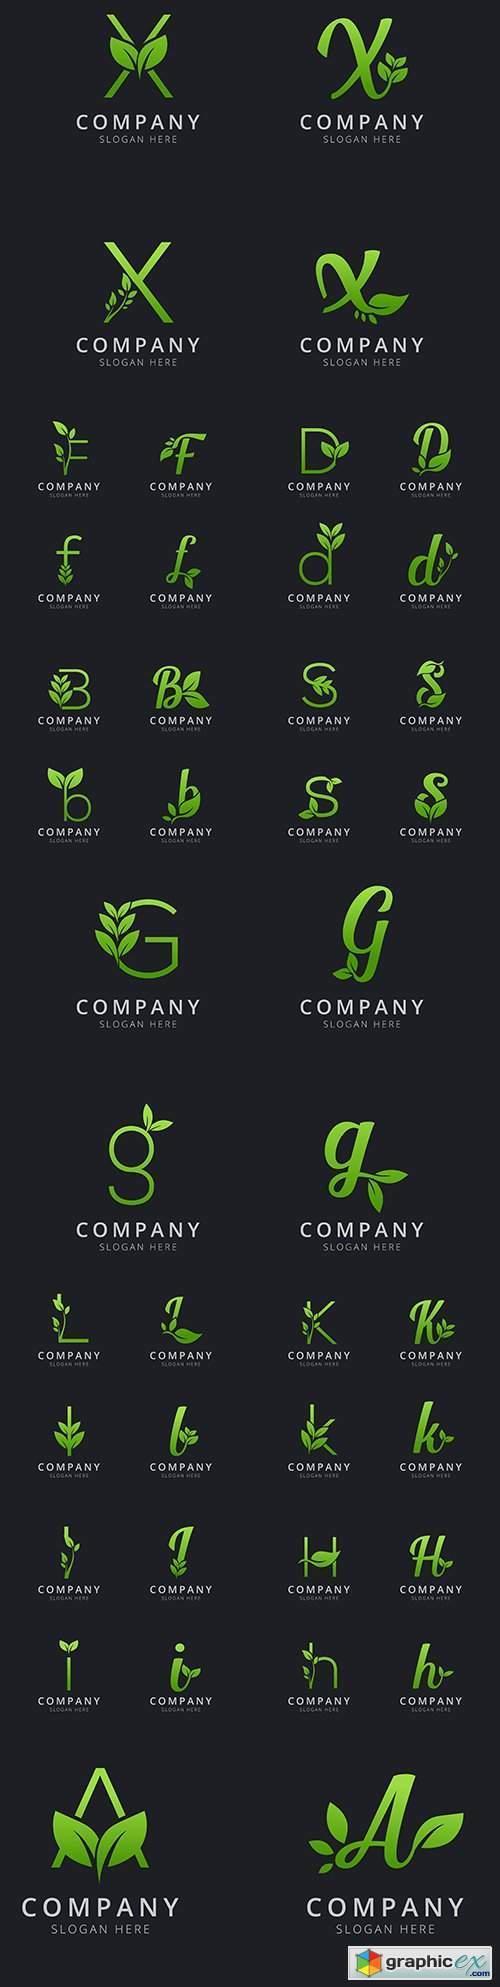 Brand name company logos business corporate design 39